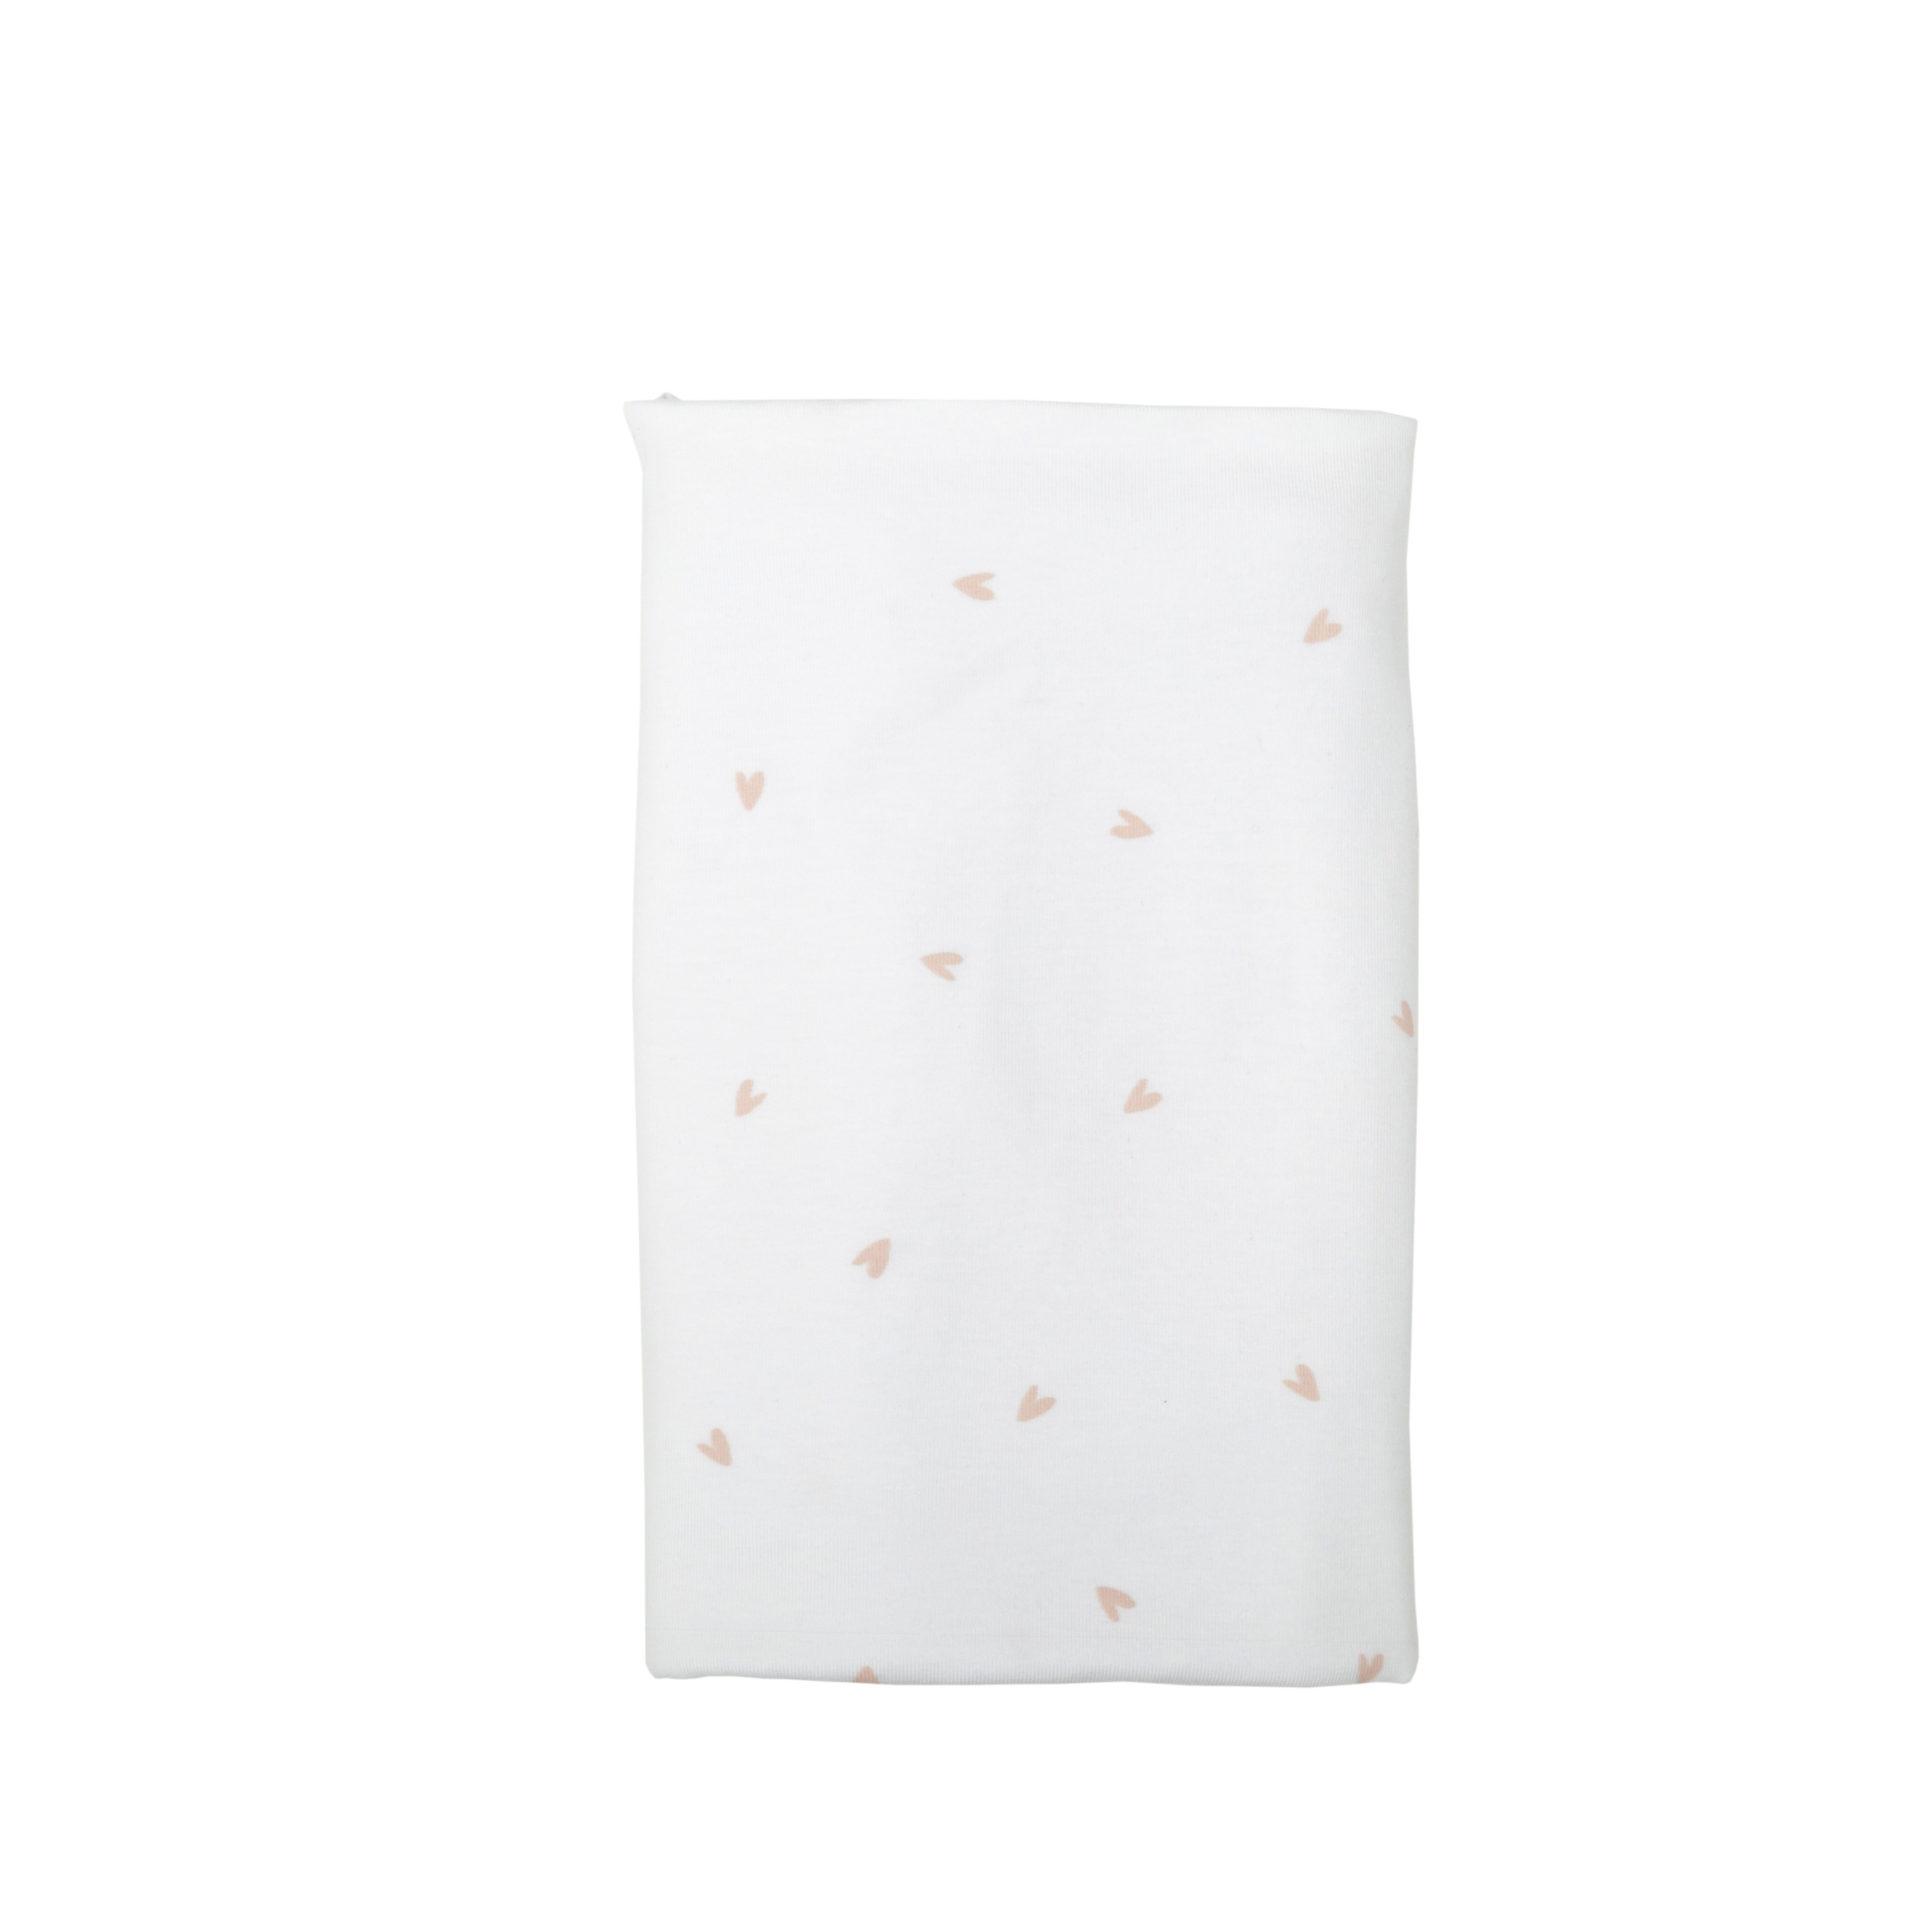 Stretchy Cotton Knit Blanket: Blush Hearts